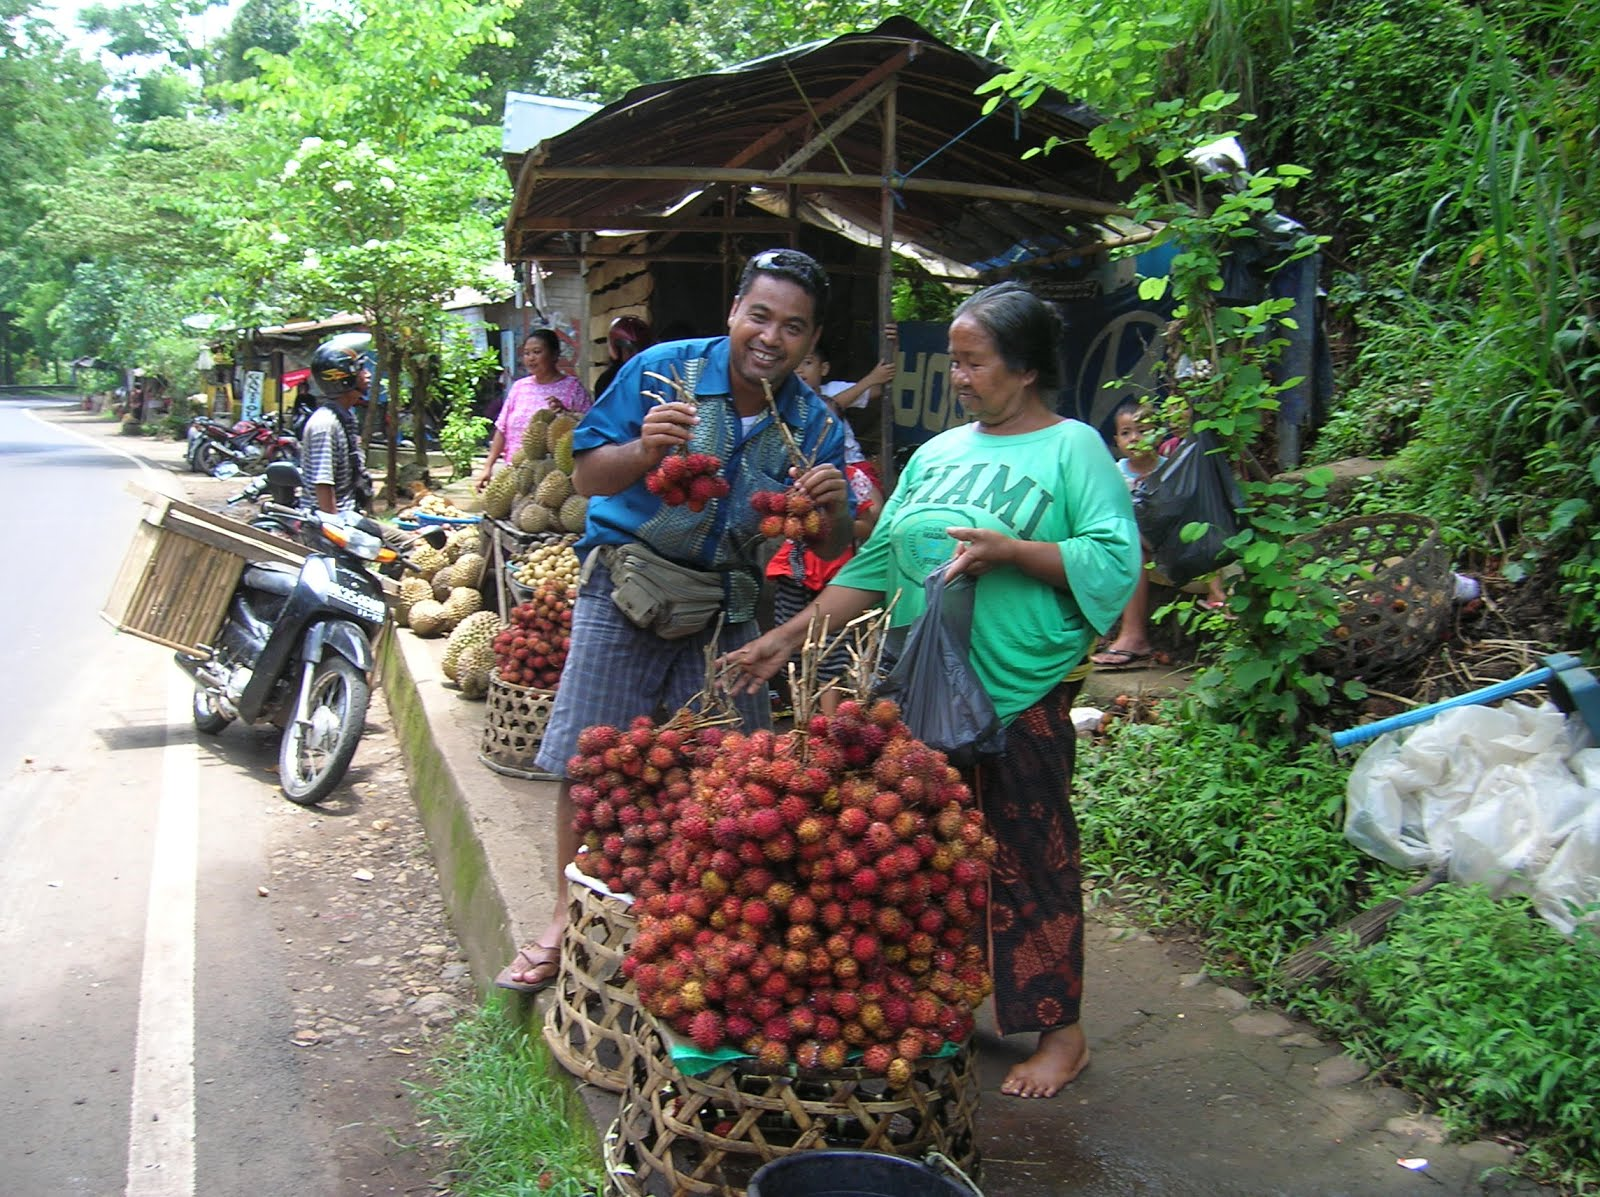 Rambutan, Isla de Bali,Indonesia, vuelta al mundo, round the world, La vuelta al mundo de Asun y Ricardo